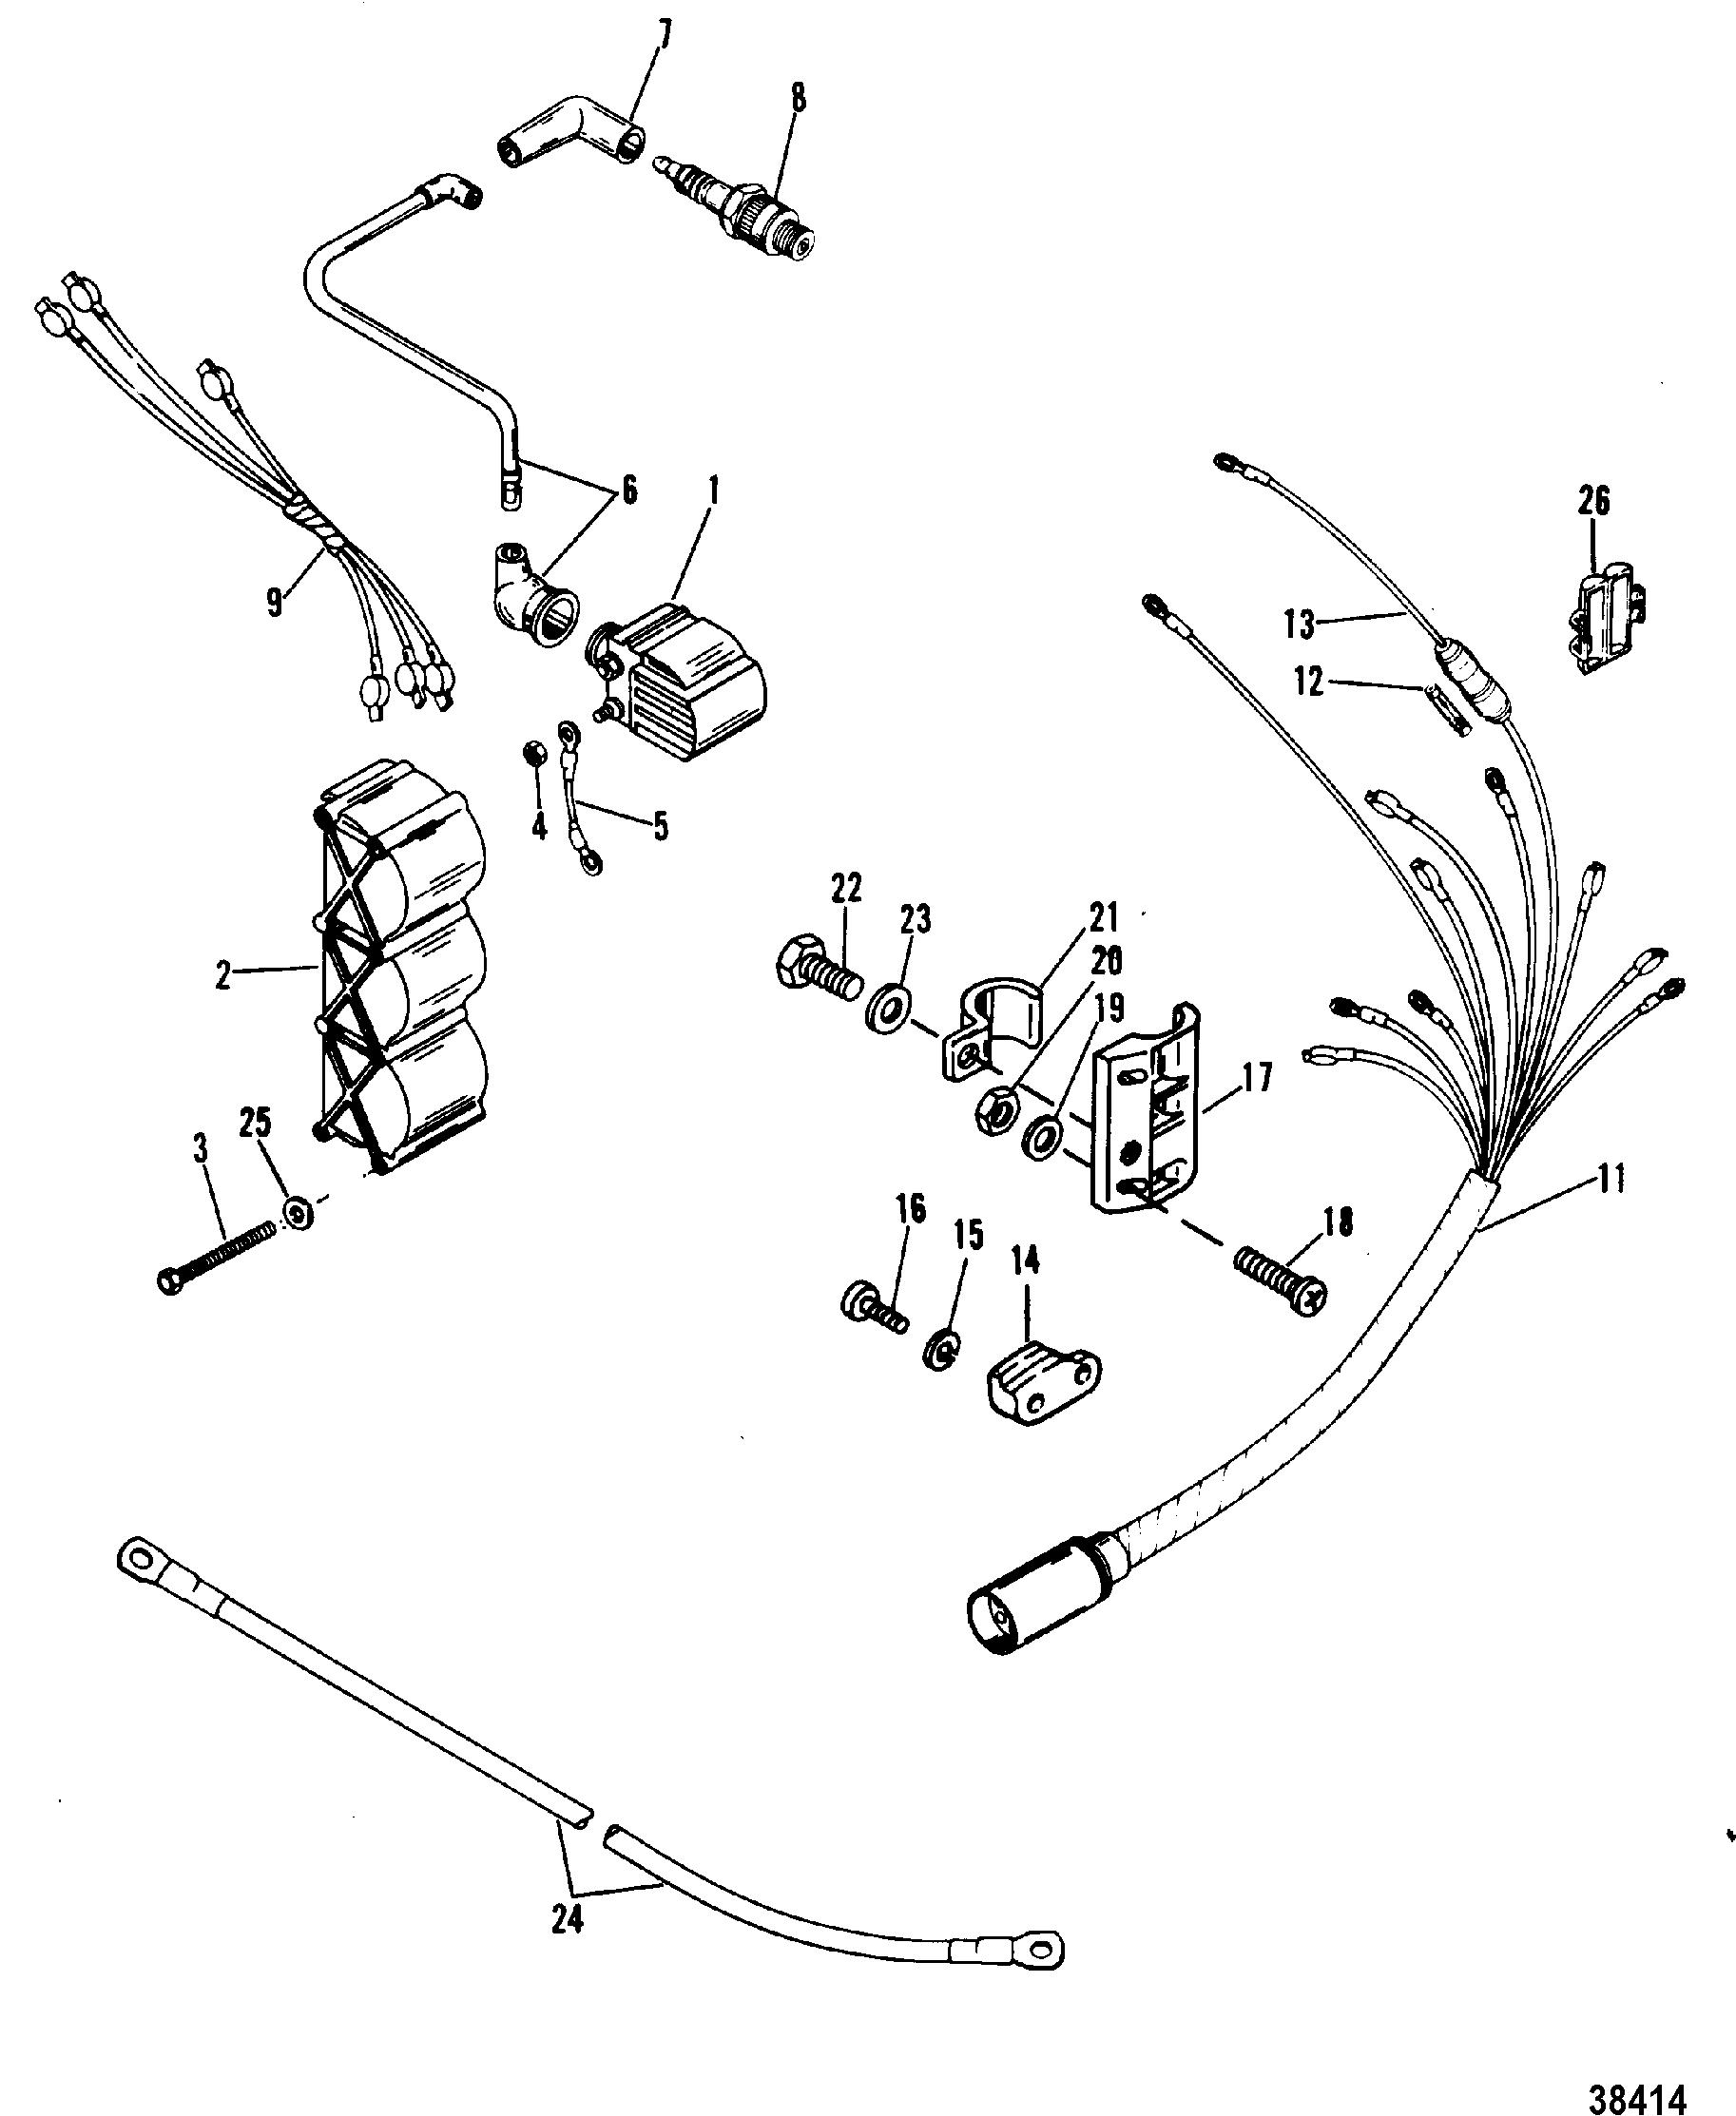 Diagram 2008 Mercury Mariner Ignition Wiring Diagram Full Version Hd Quality Wiring Diagram Svtvripwge143 Edilgress It